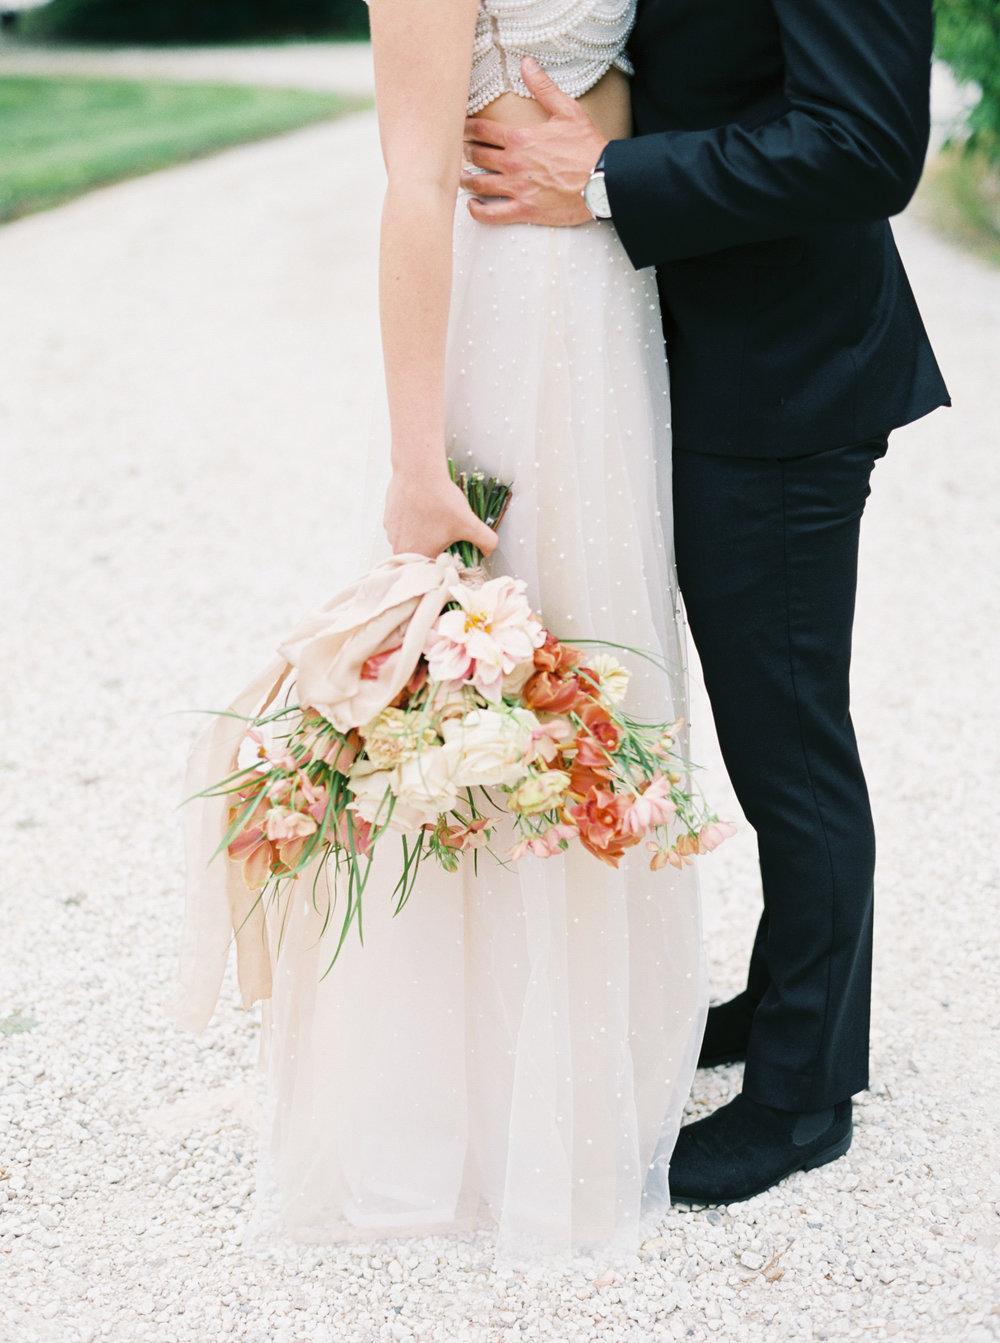 Timeless Southern Highland Wedding Elopement in Bowral NSW Fine Art Film Photographer Sheri McMahon-32.jpg